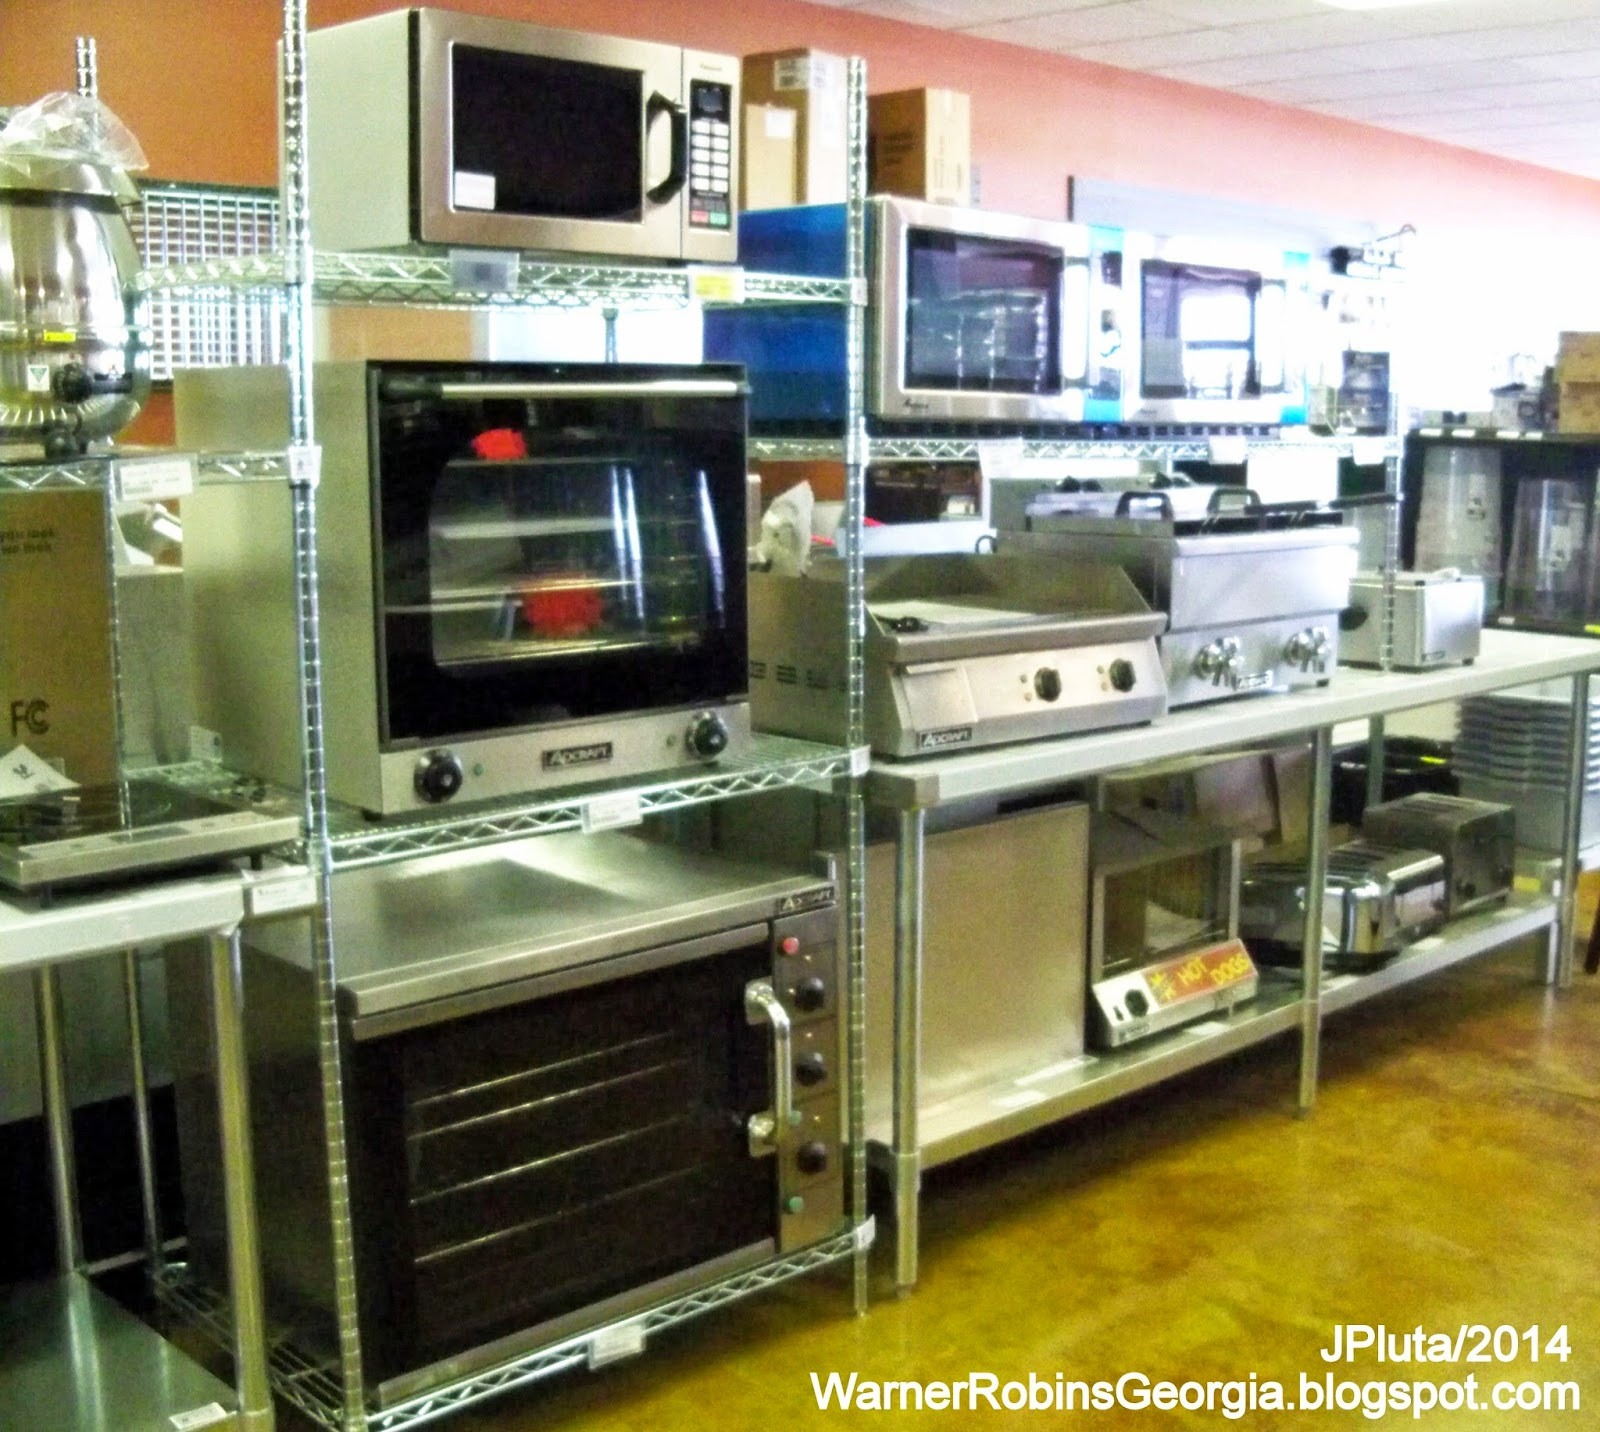 Kitchens Store: WARNER ROBINS GEORGIA Air Force Base Houston Restaurant